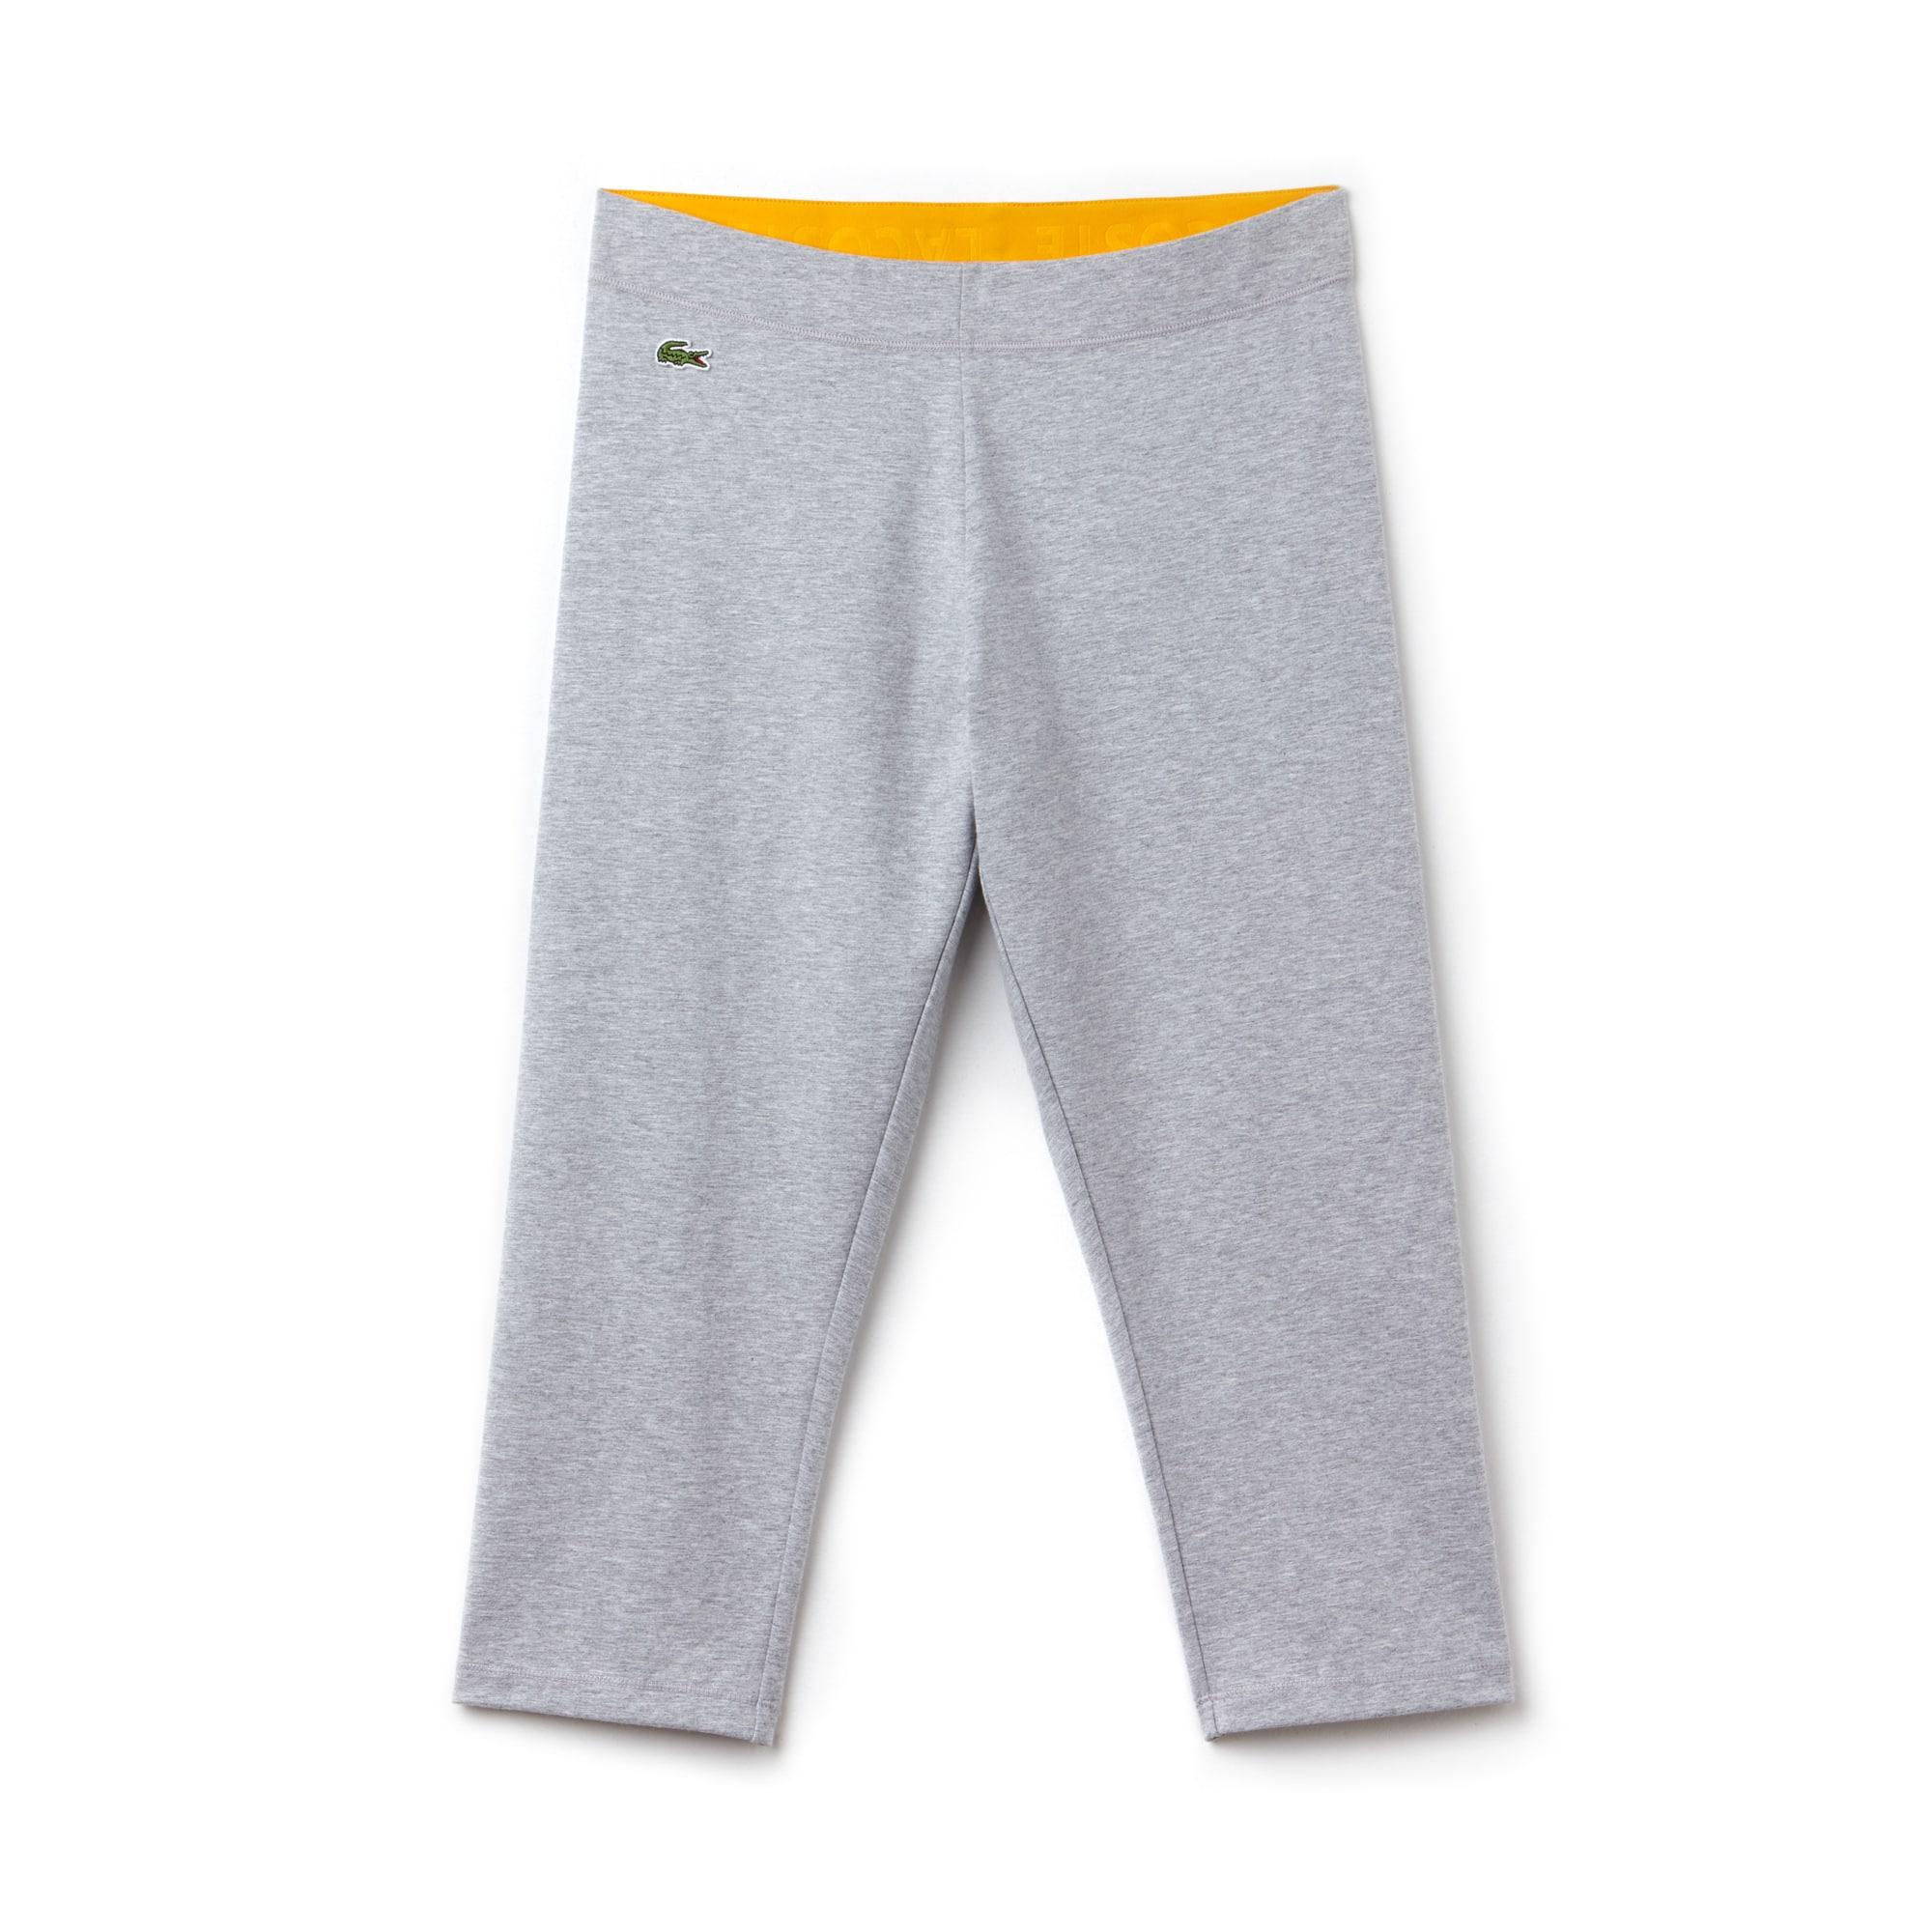 Lacoste SPORT Tennis-legging dames jersey met stretch